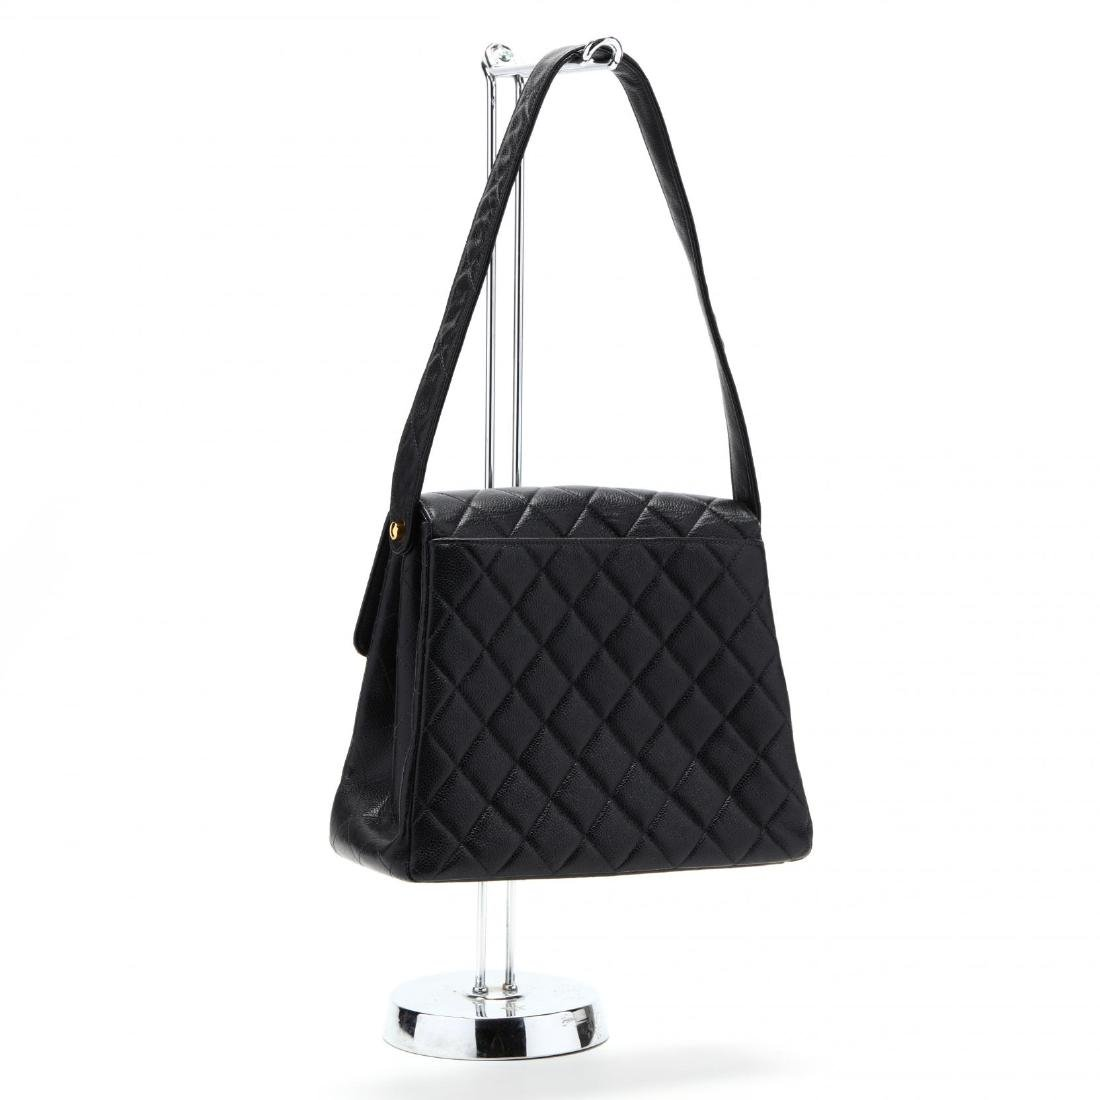 Caviar Leather Trapeze Flap Handbag, Chanel - 6